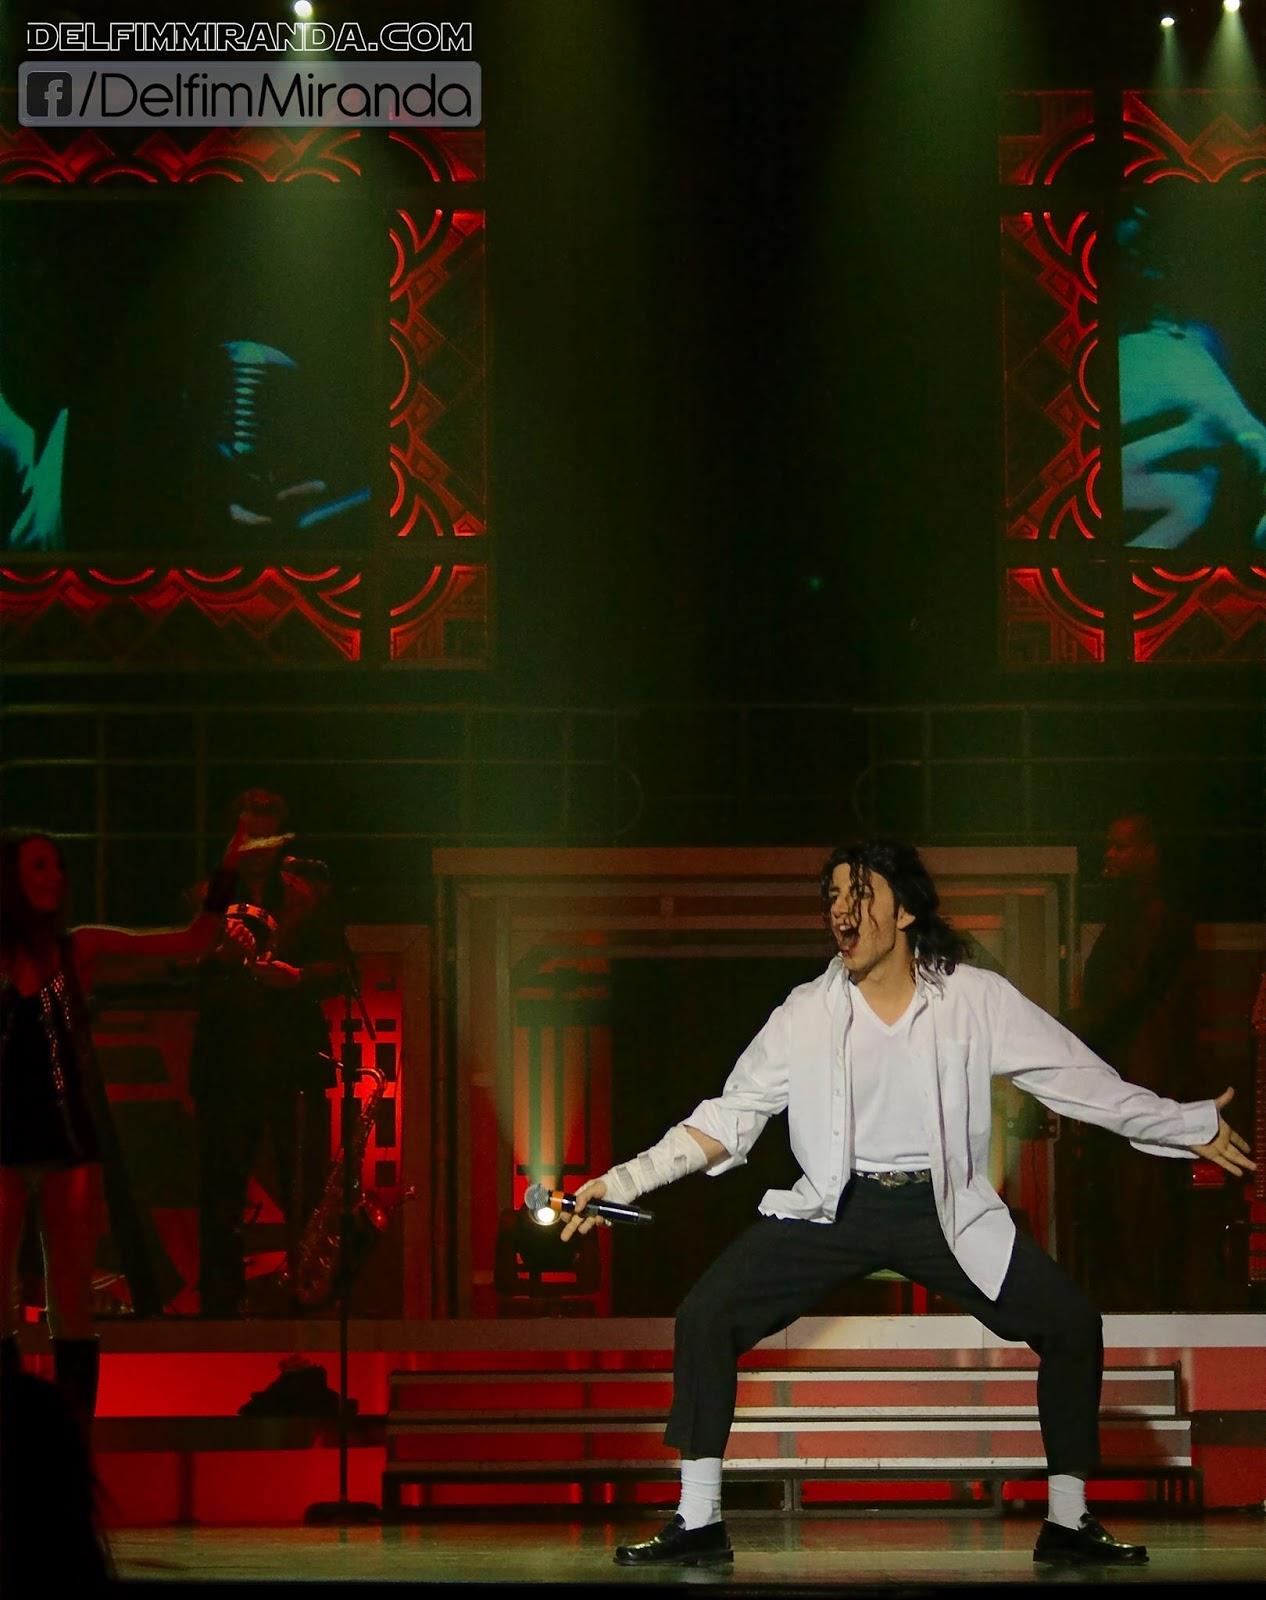 Delfim Miranda - Michael Jackson Tribute - Live in Las Vegas - Legends in Concert the biggest tribute show in the world